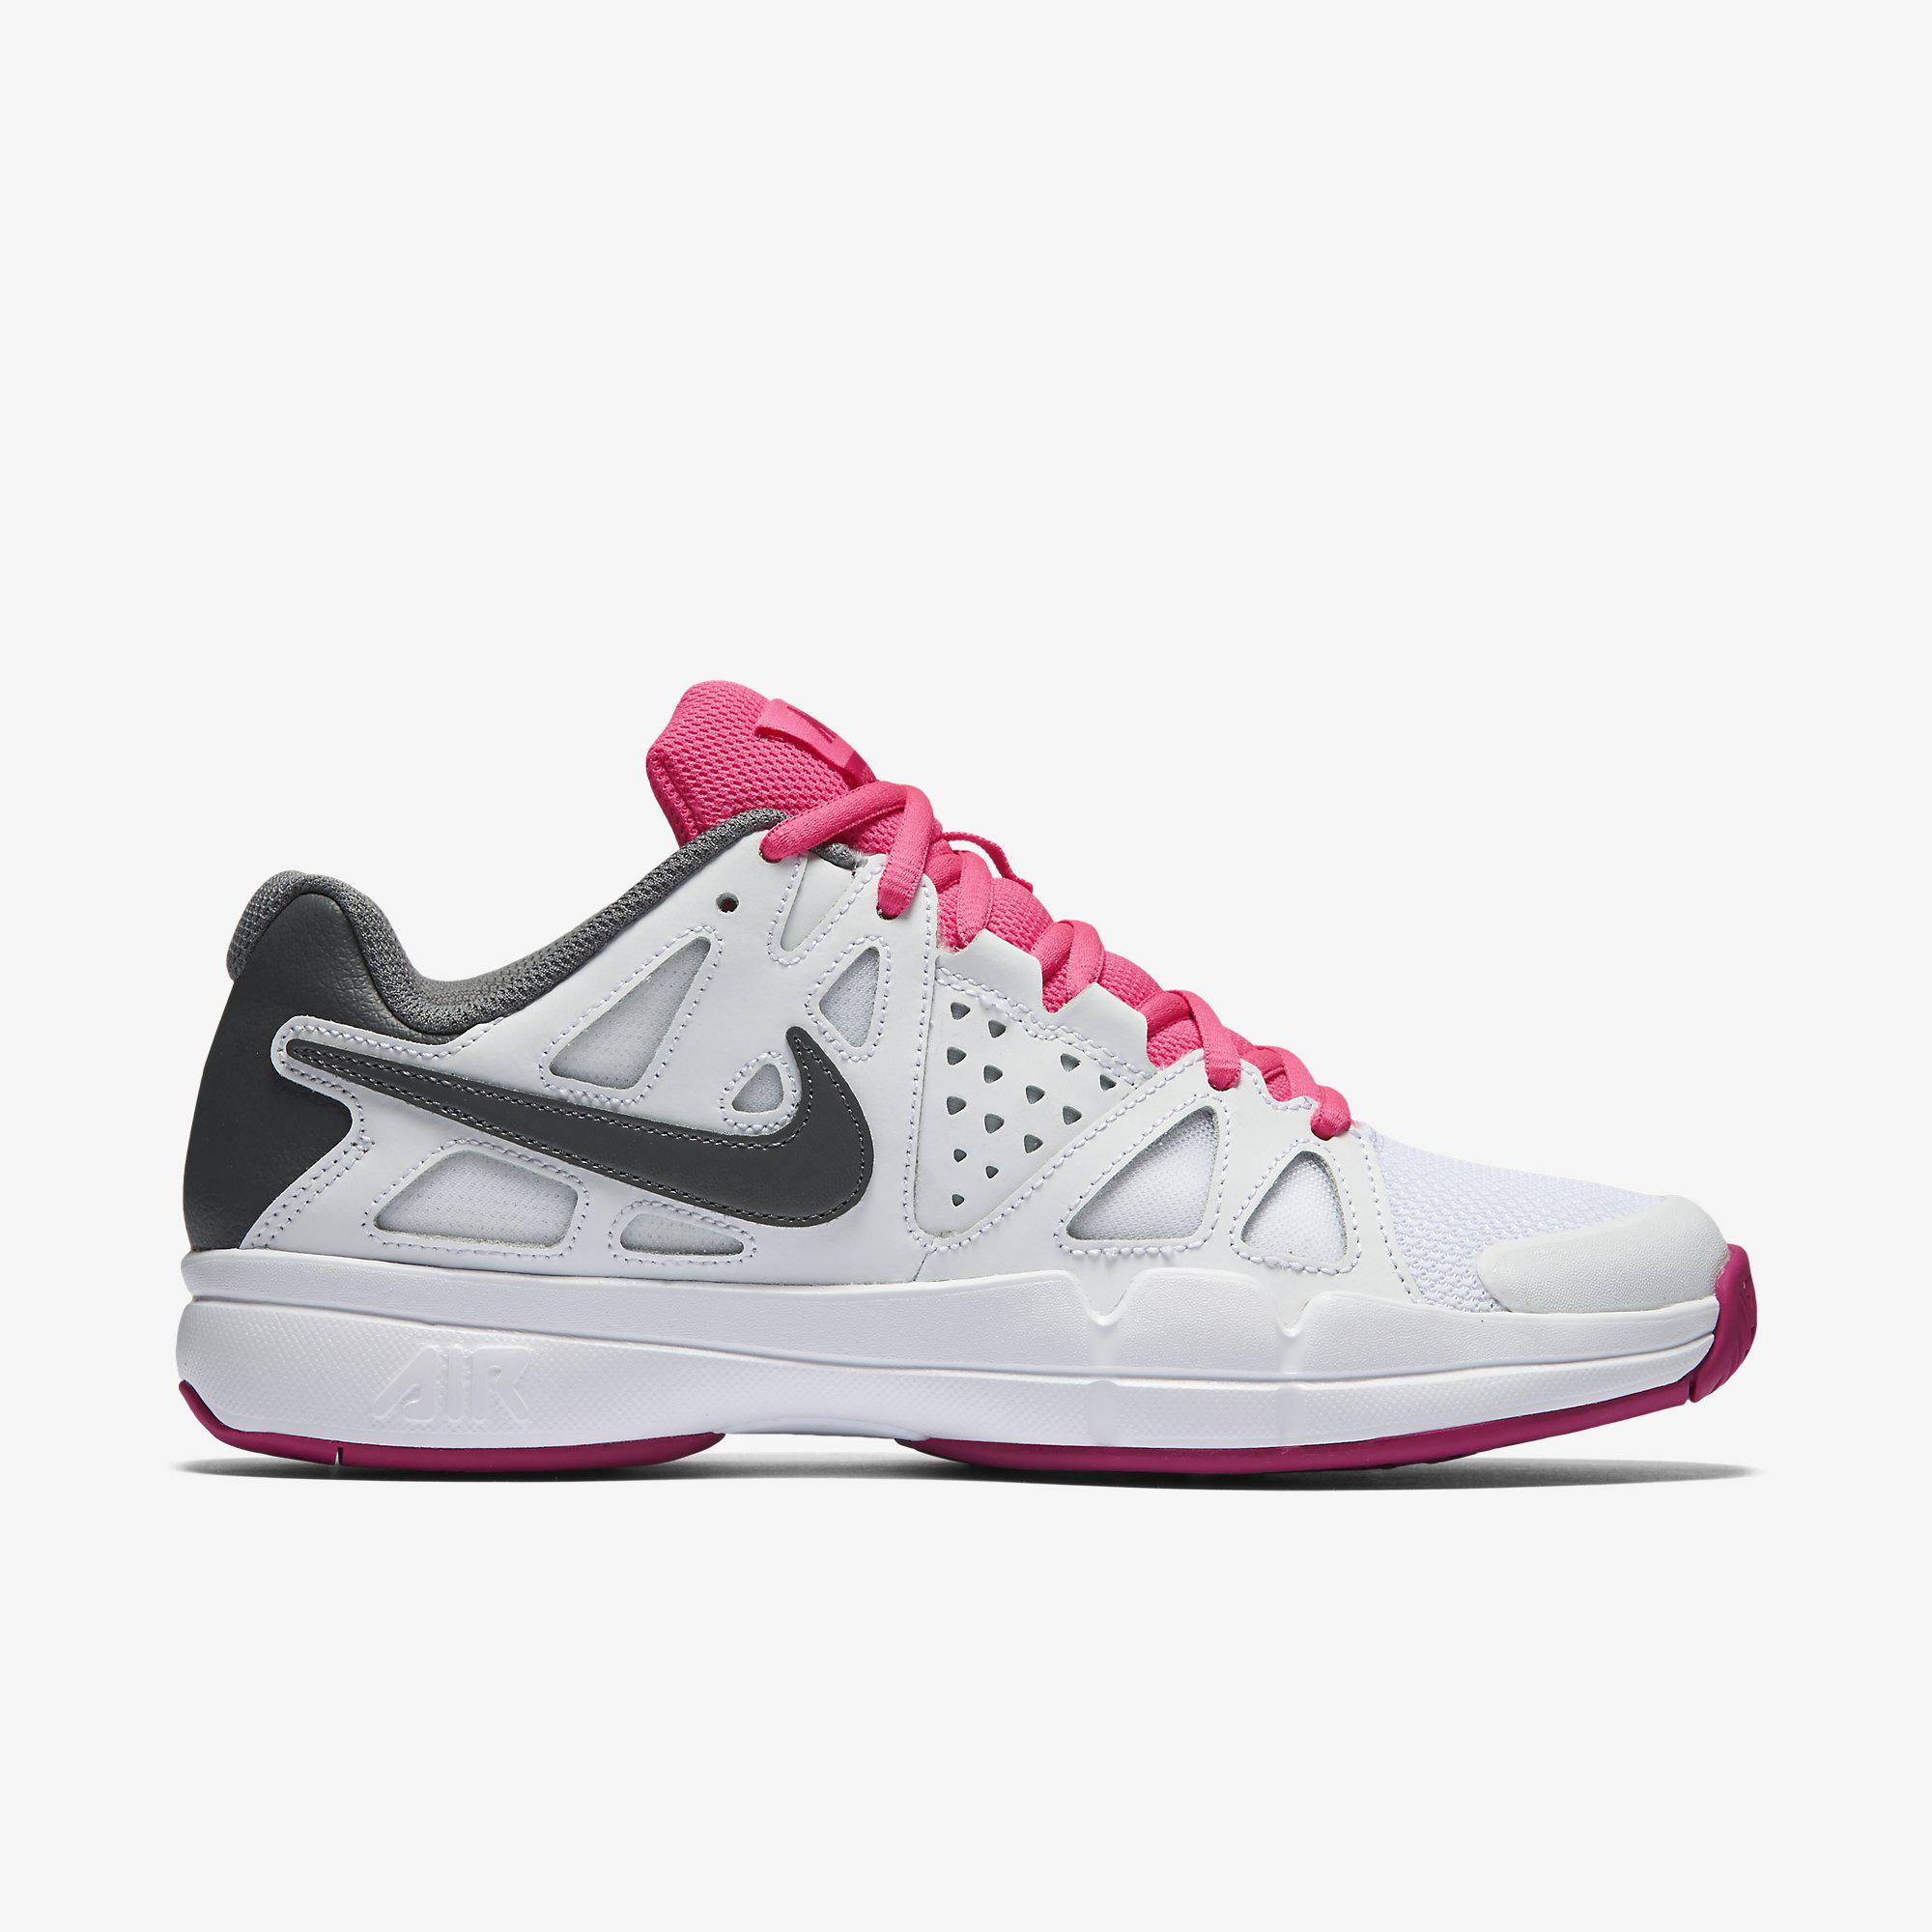 2078fa6621f6 Nike Womens Air Vapor Advantage Tennis Shoes - White Pink - Tennisnuts.com